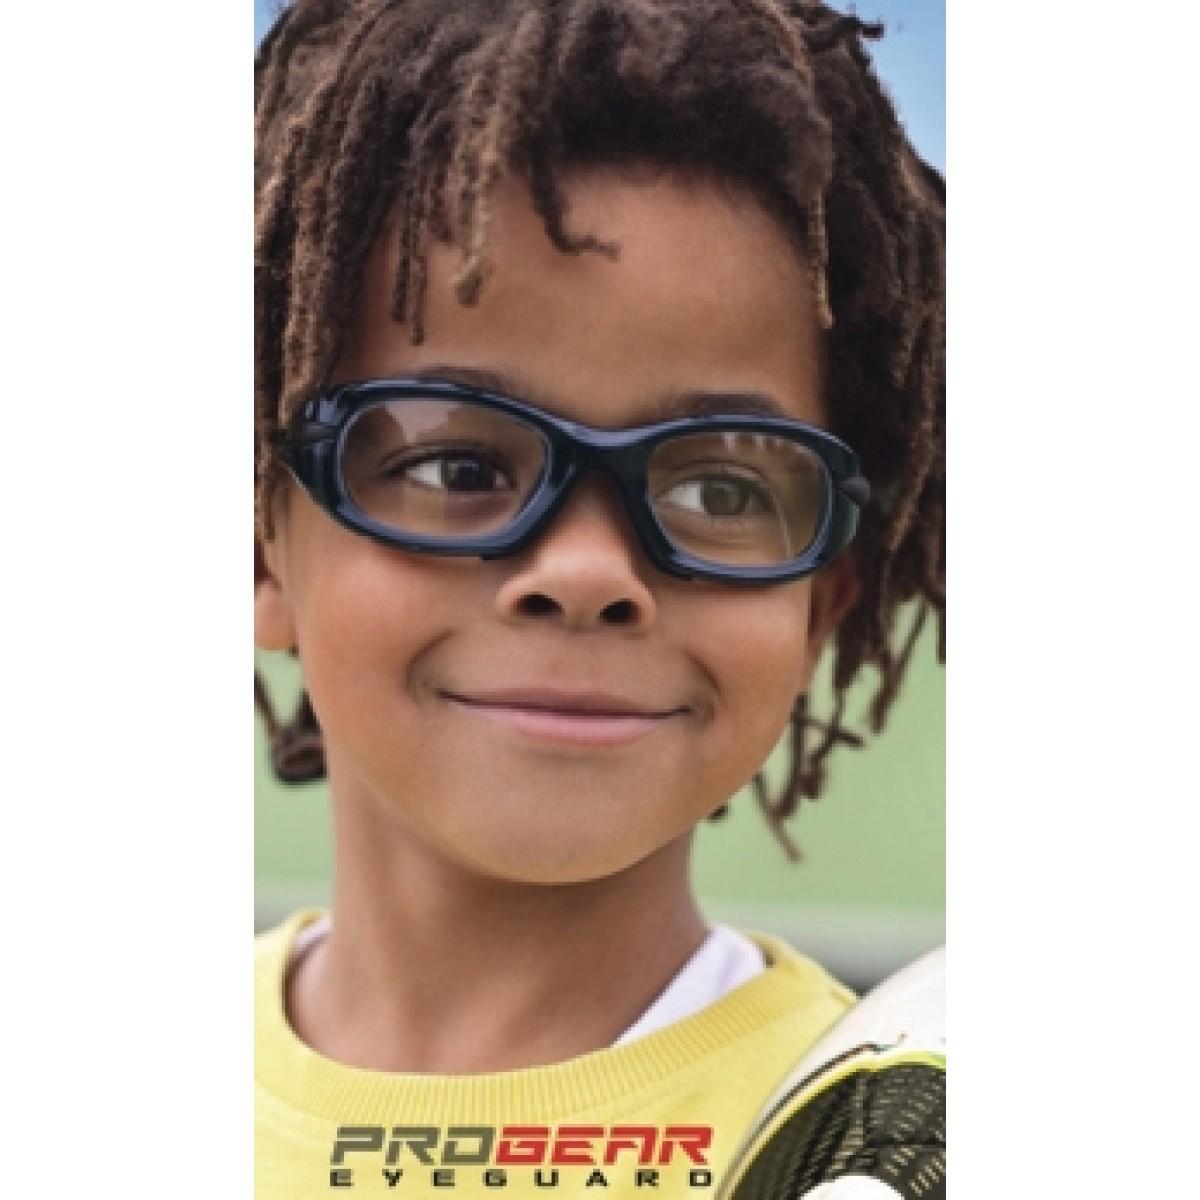 Óculos Progear Infantil Azul TM 48 c  Grau e Lentes Anti-Embaçantes 76d715abca